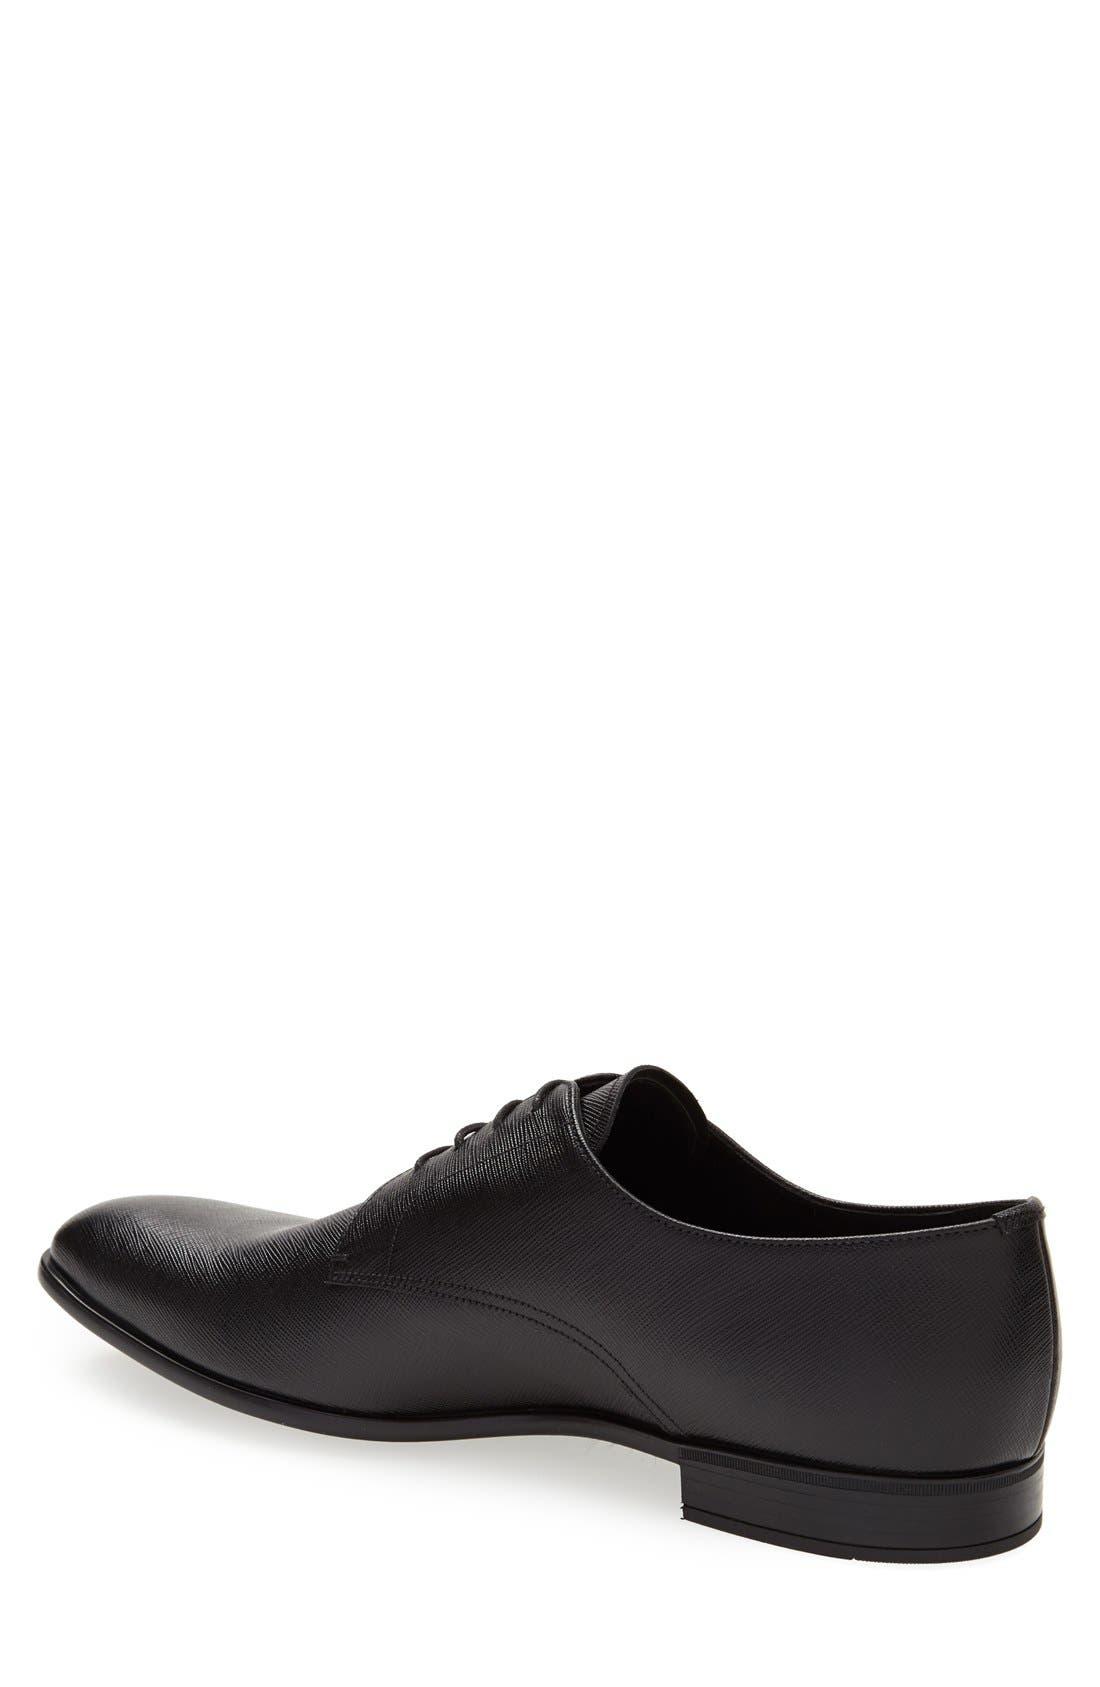 PRADA, Plain Toe Derby, Alternate thumbnail 4, color, BLACK